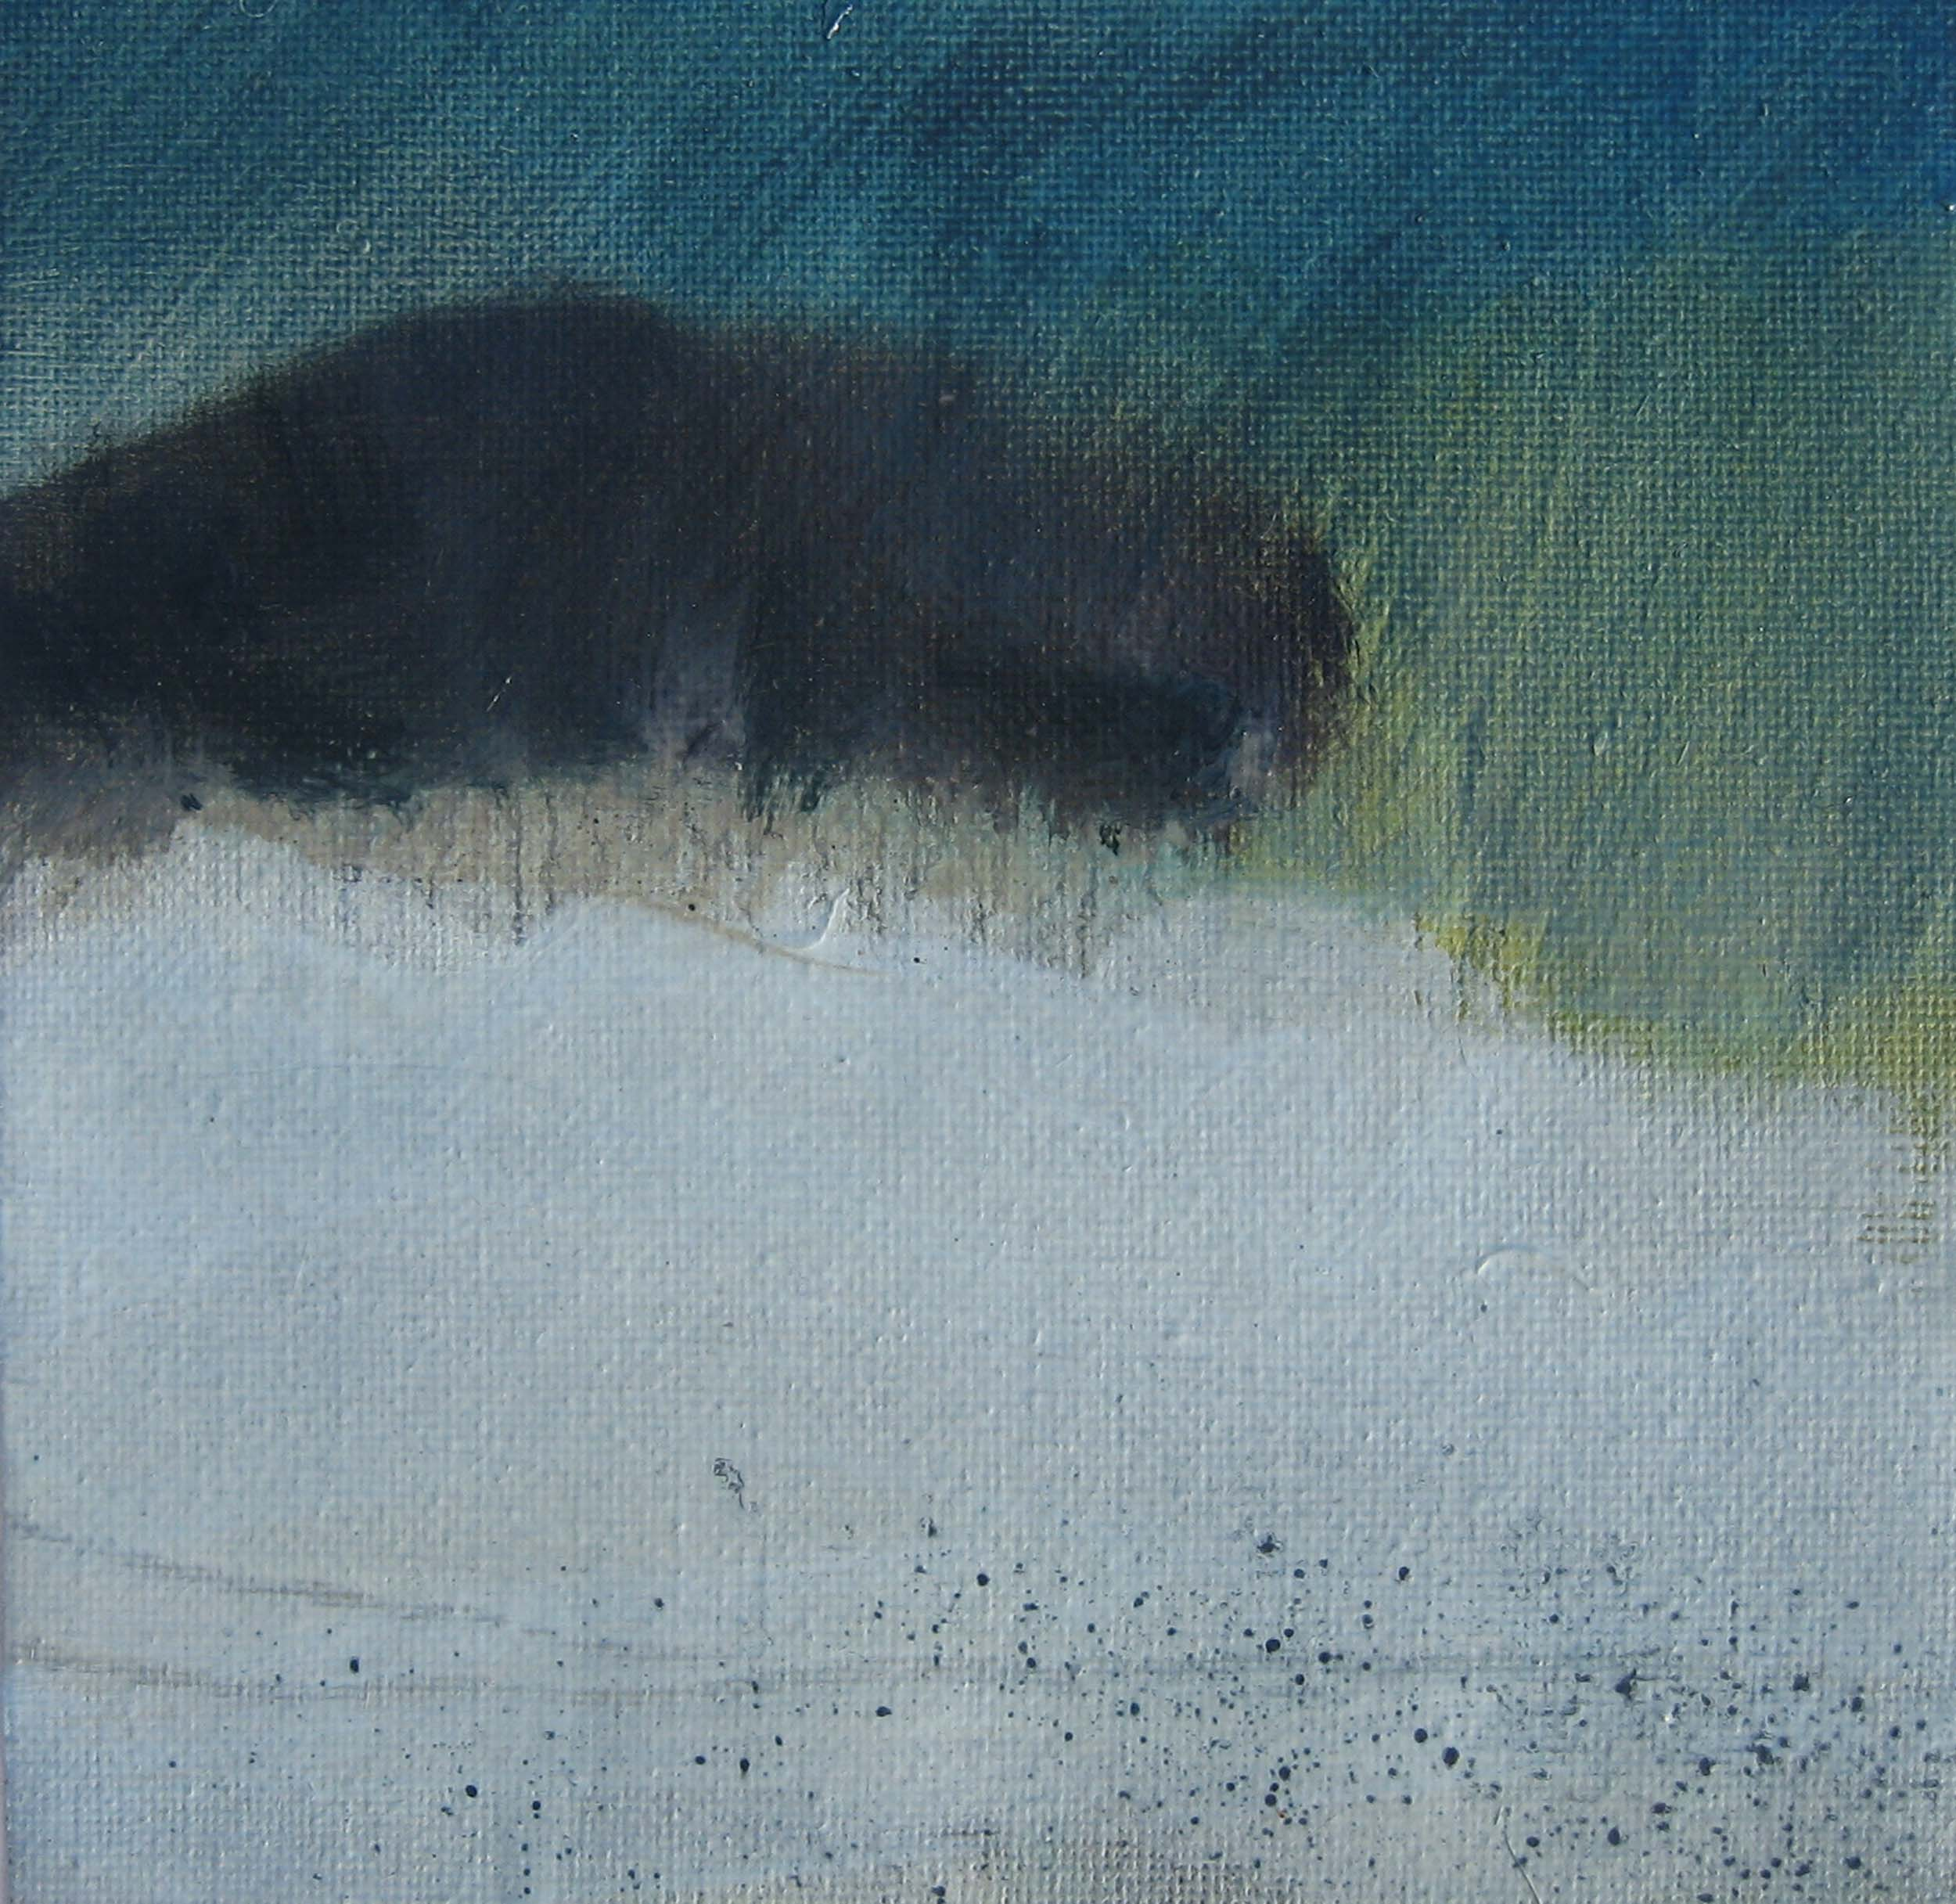 Leah Beggs 2008 - Copse - Oil on Paper 15 x 15cm_sml.jpg